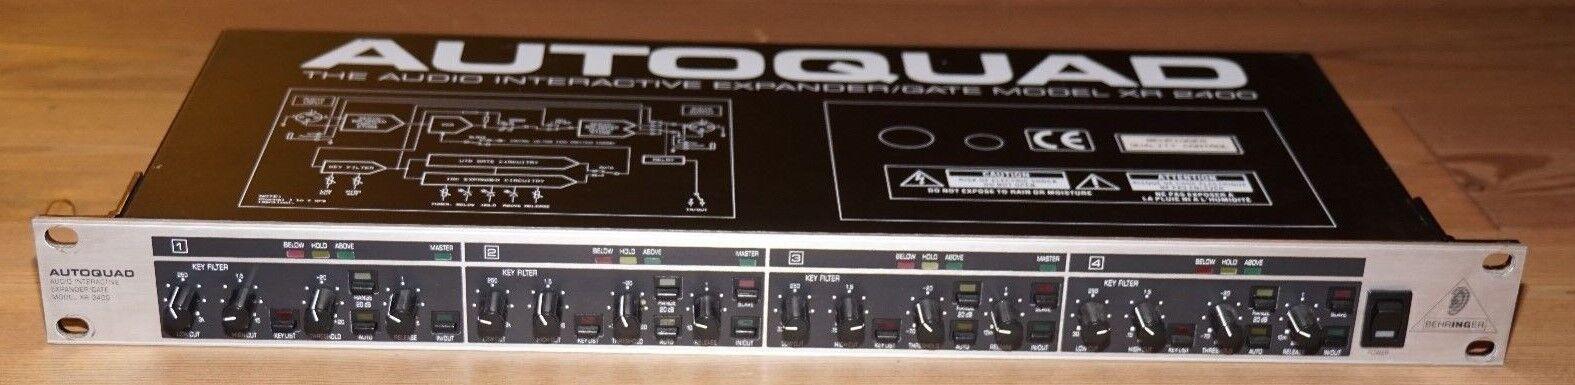 Behringer XR-2400 Autoquad The Audio Interactive Expander Gate